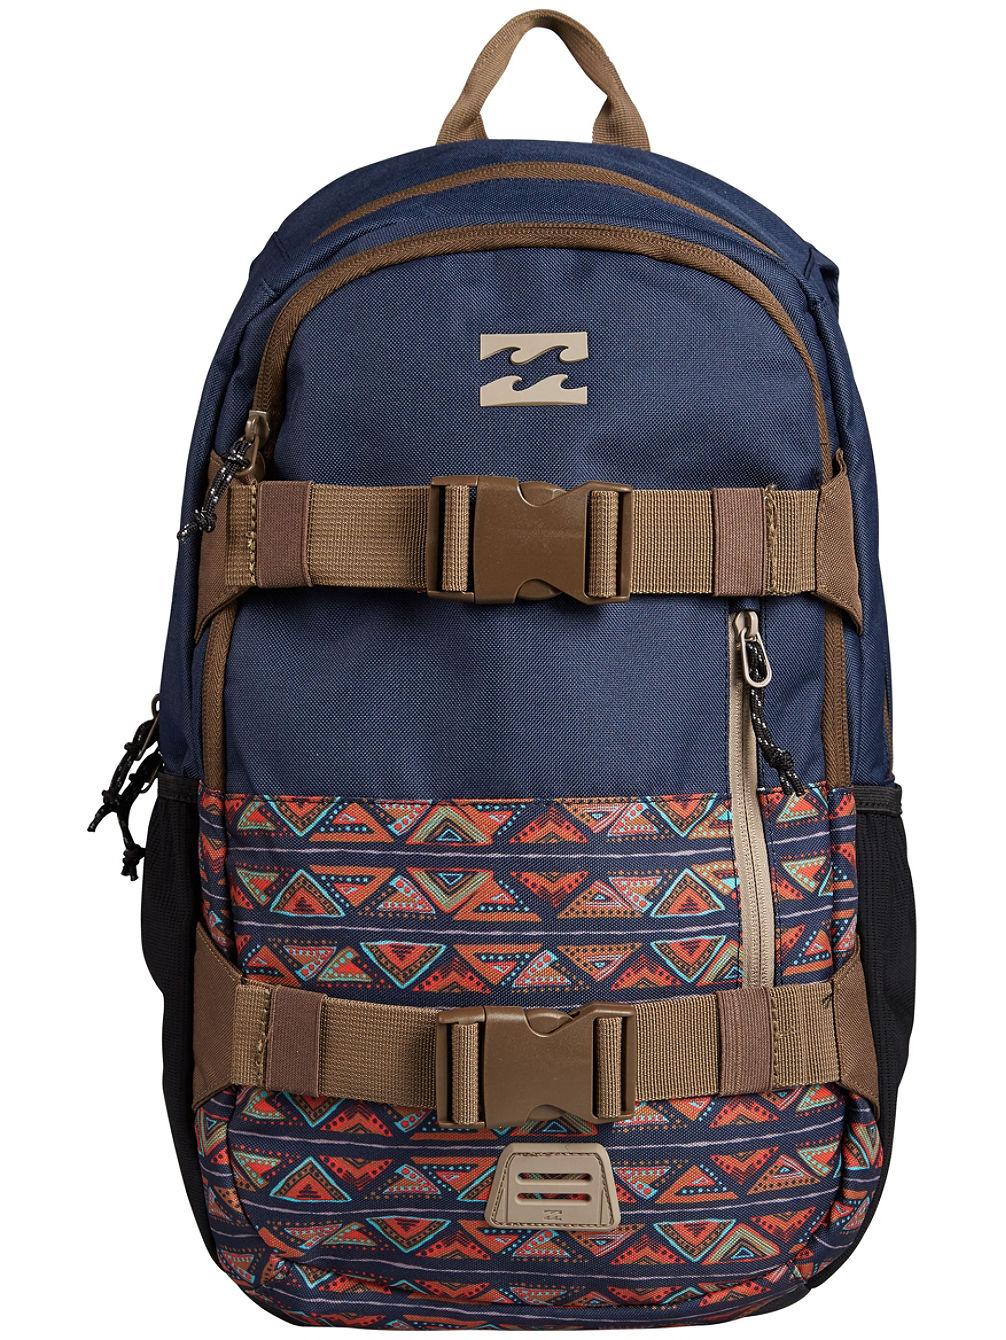 59f36c36ec096 Buy Billabong Command Skate Backpack online at Blue Tomato